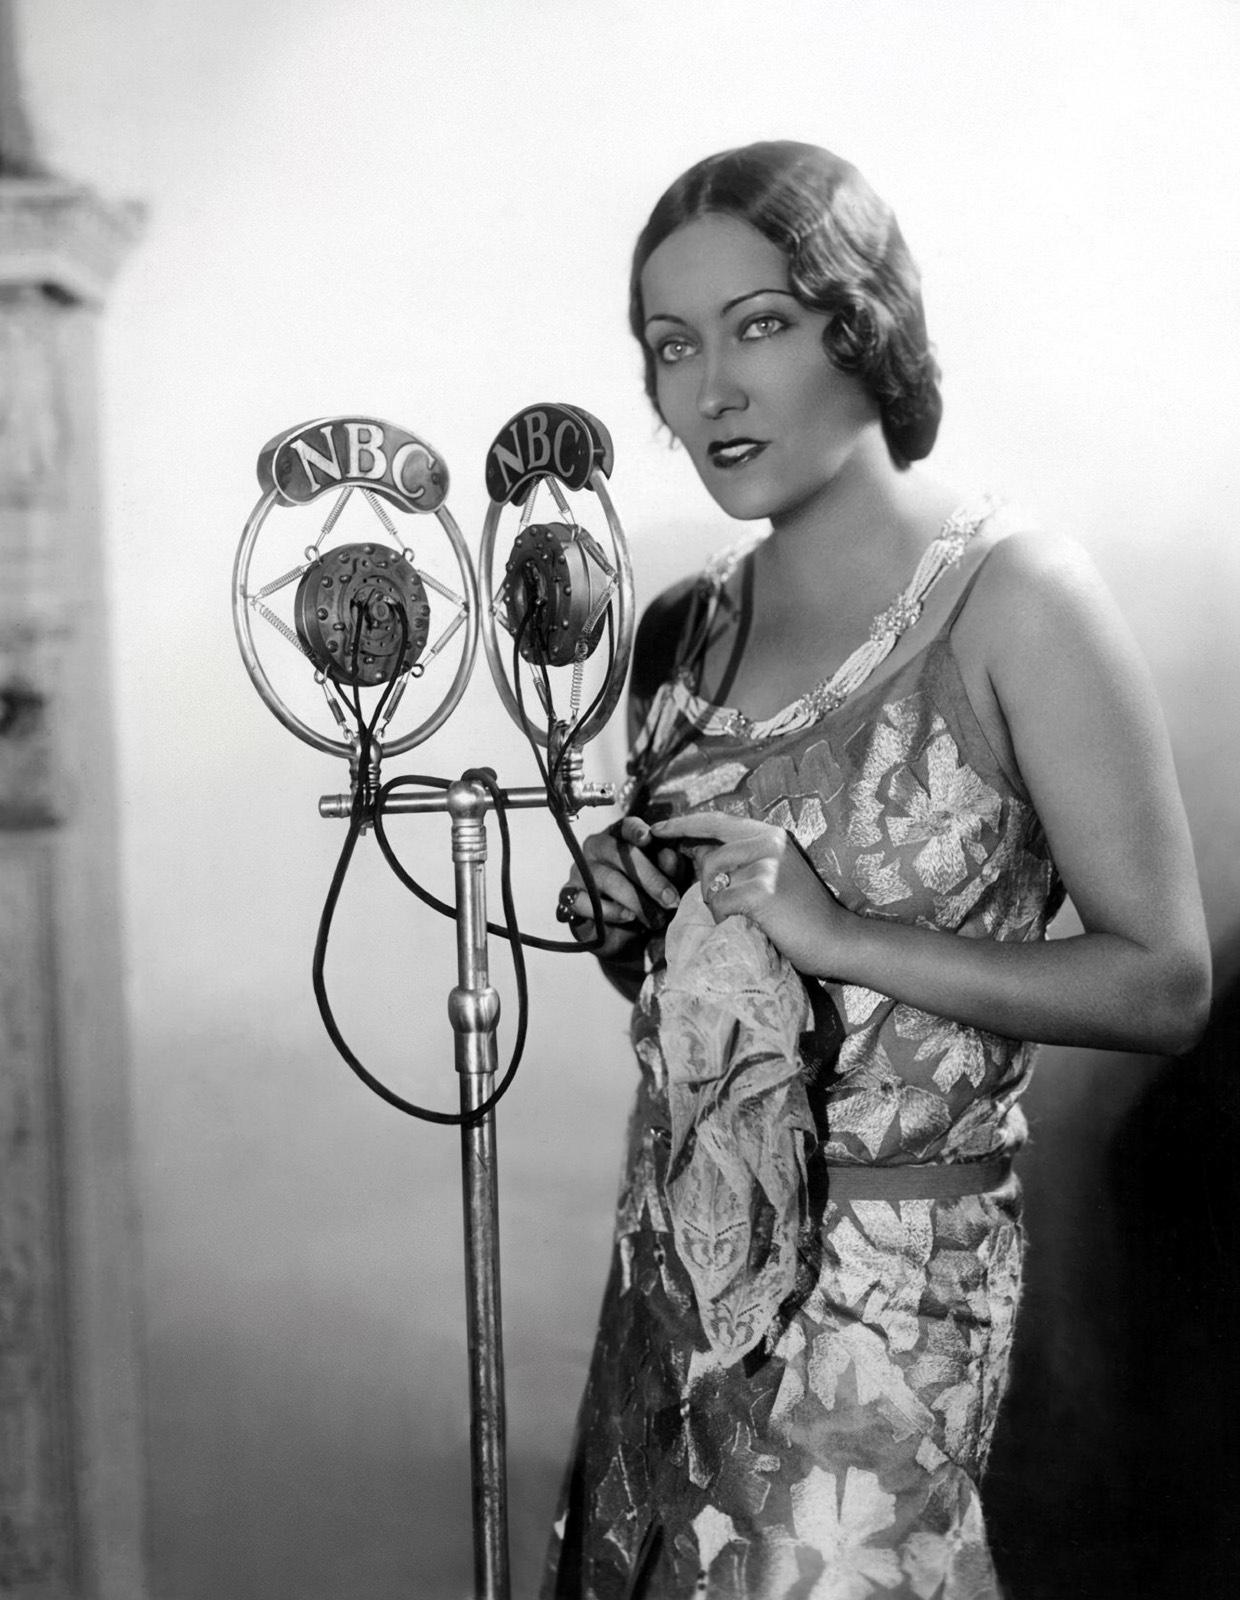 Meredith Deane,Wendy Craig (born 1934) Hot pics & movies Diana Dors (1931?984),Yvette Dugay